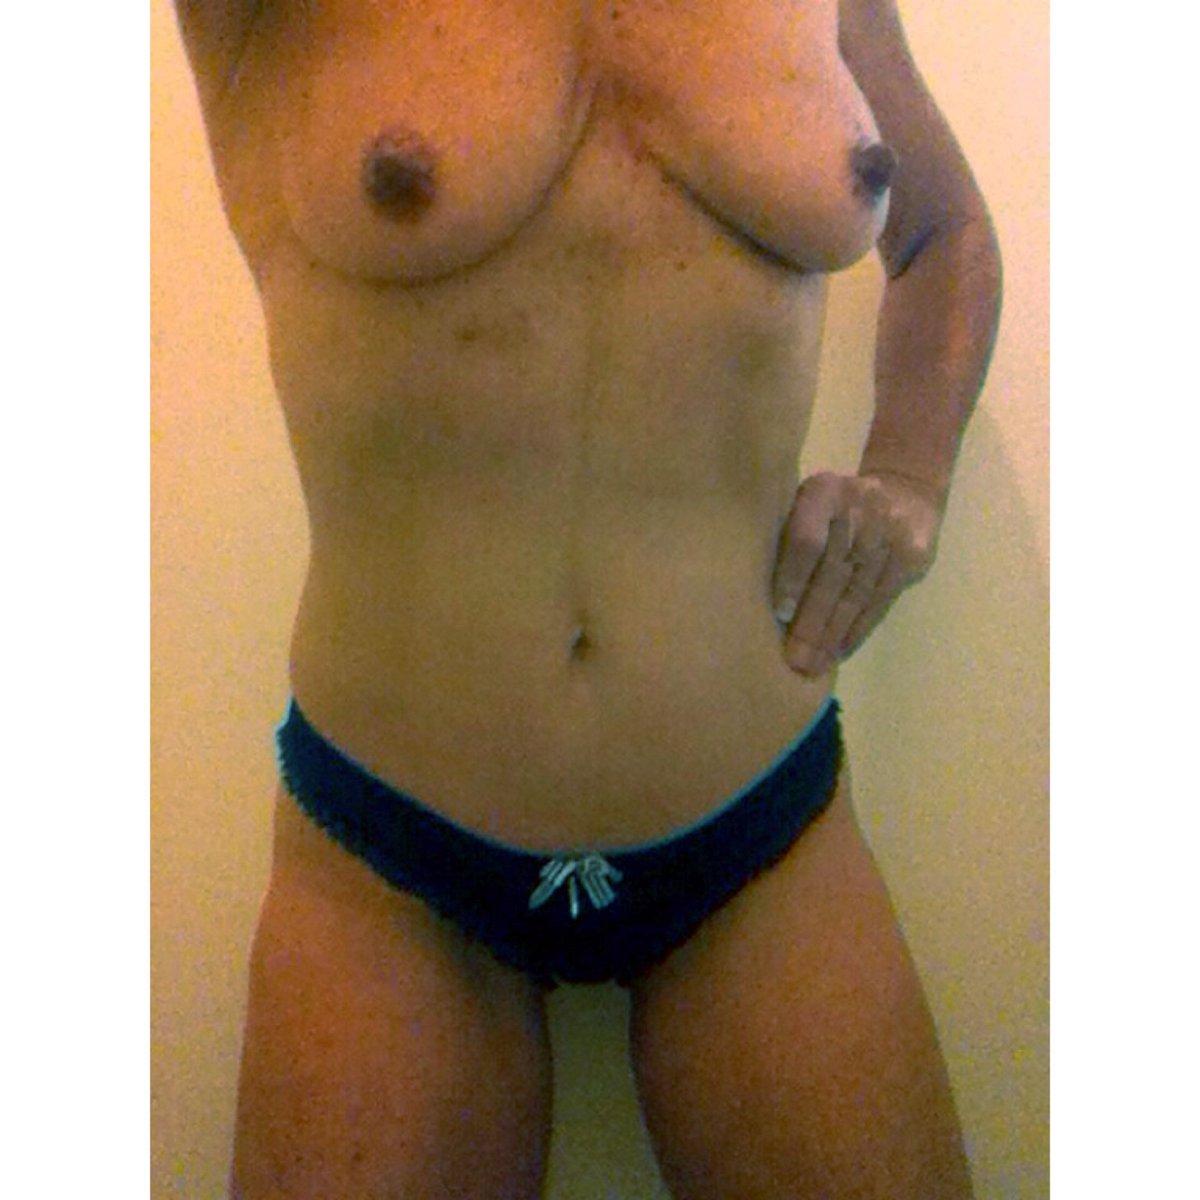 Nude Selfie 6554